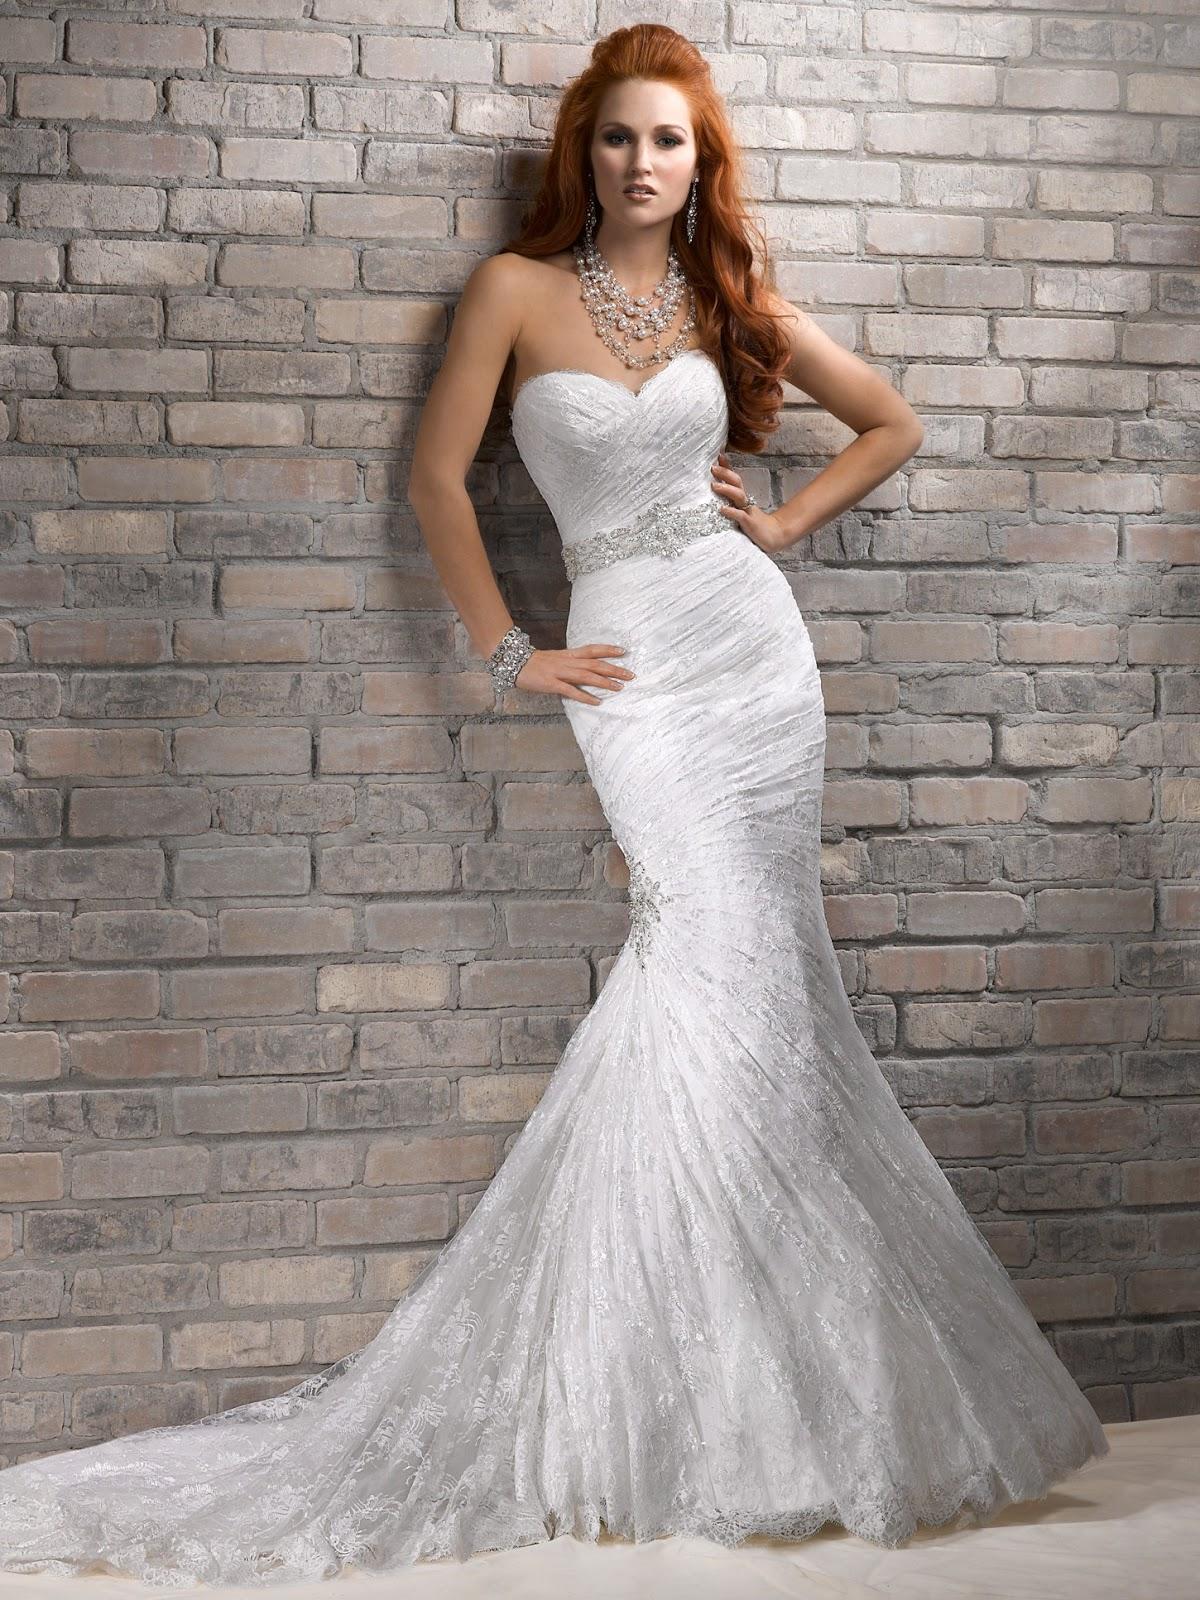 Wedding Dresses Mermaid Sweetheart Neckline edee1f40fb